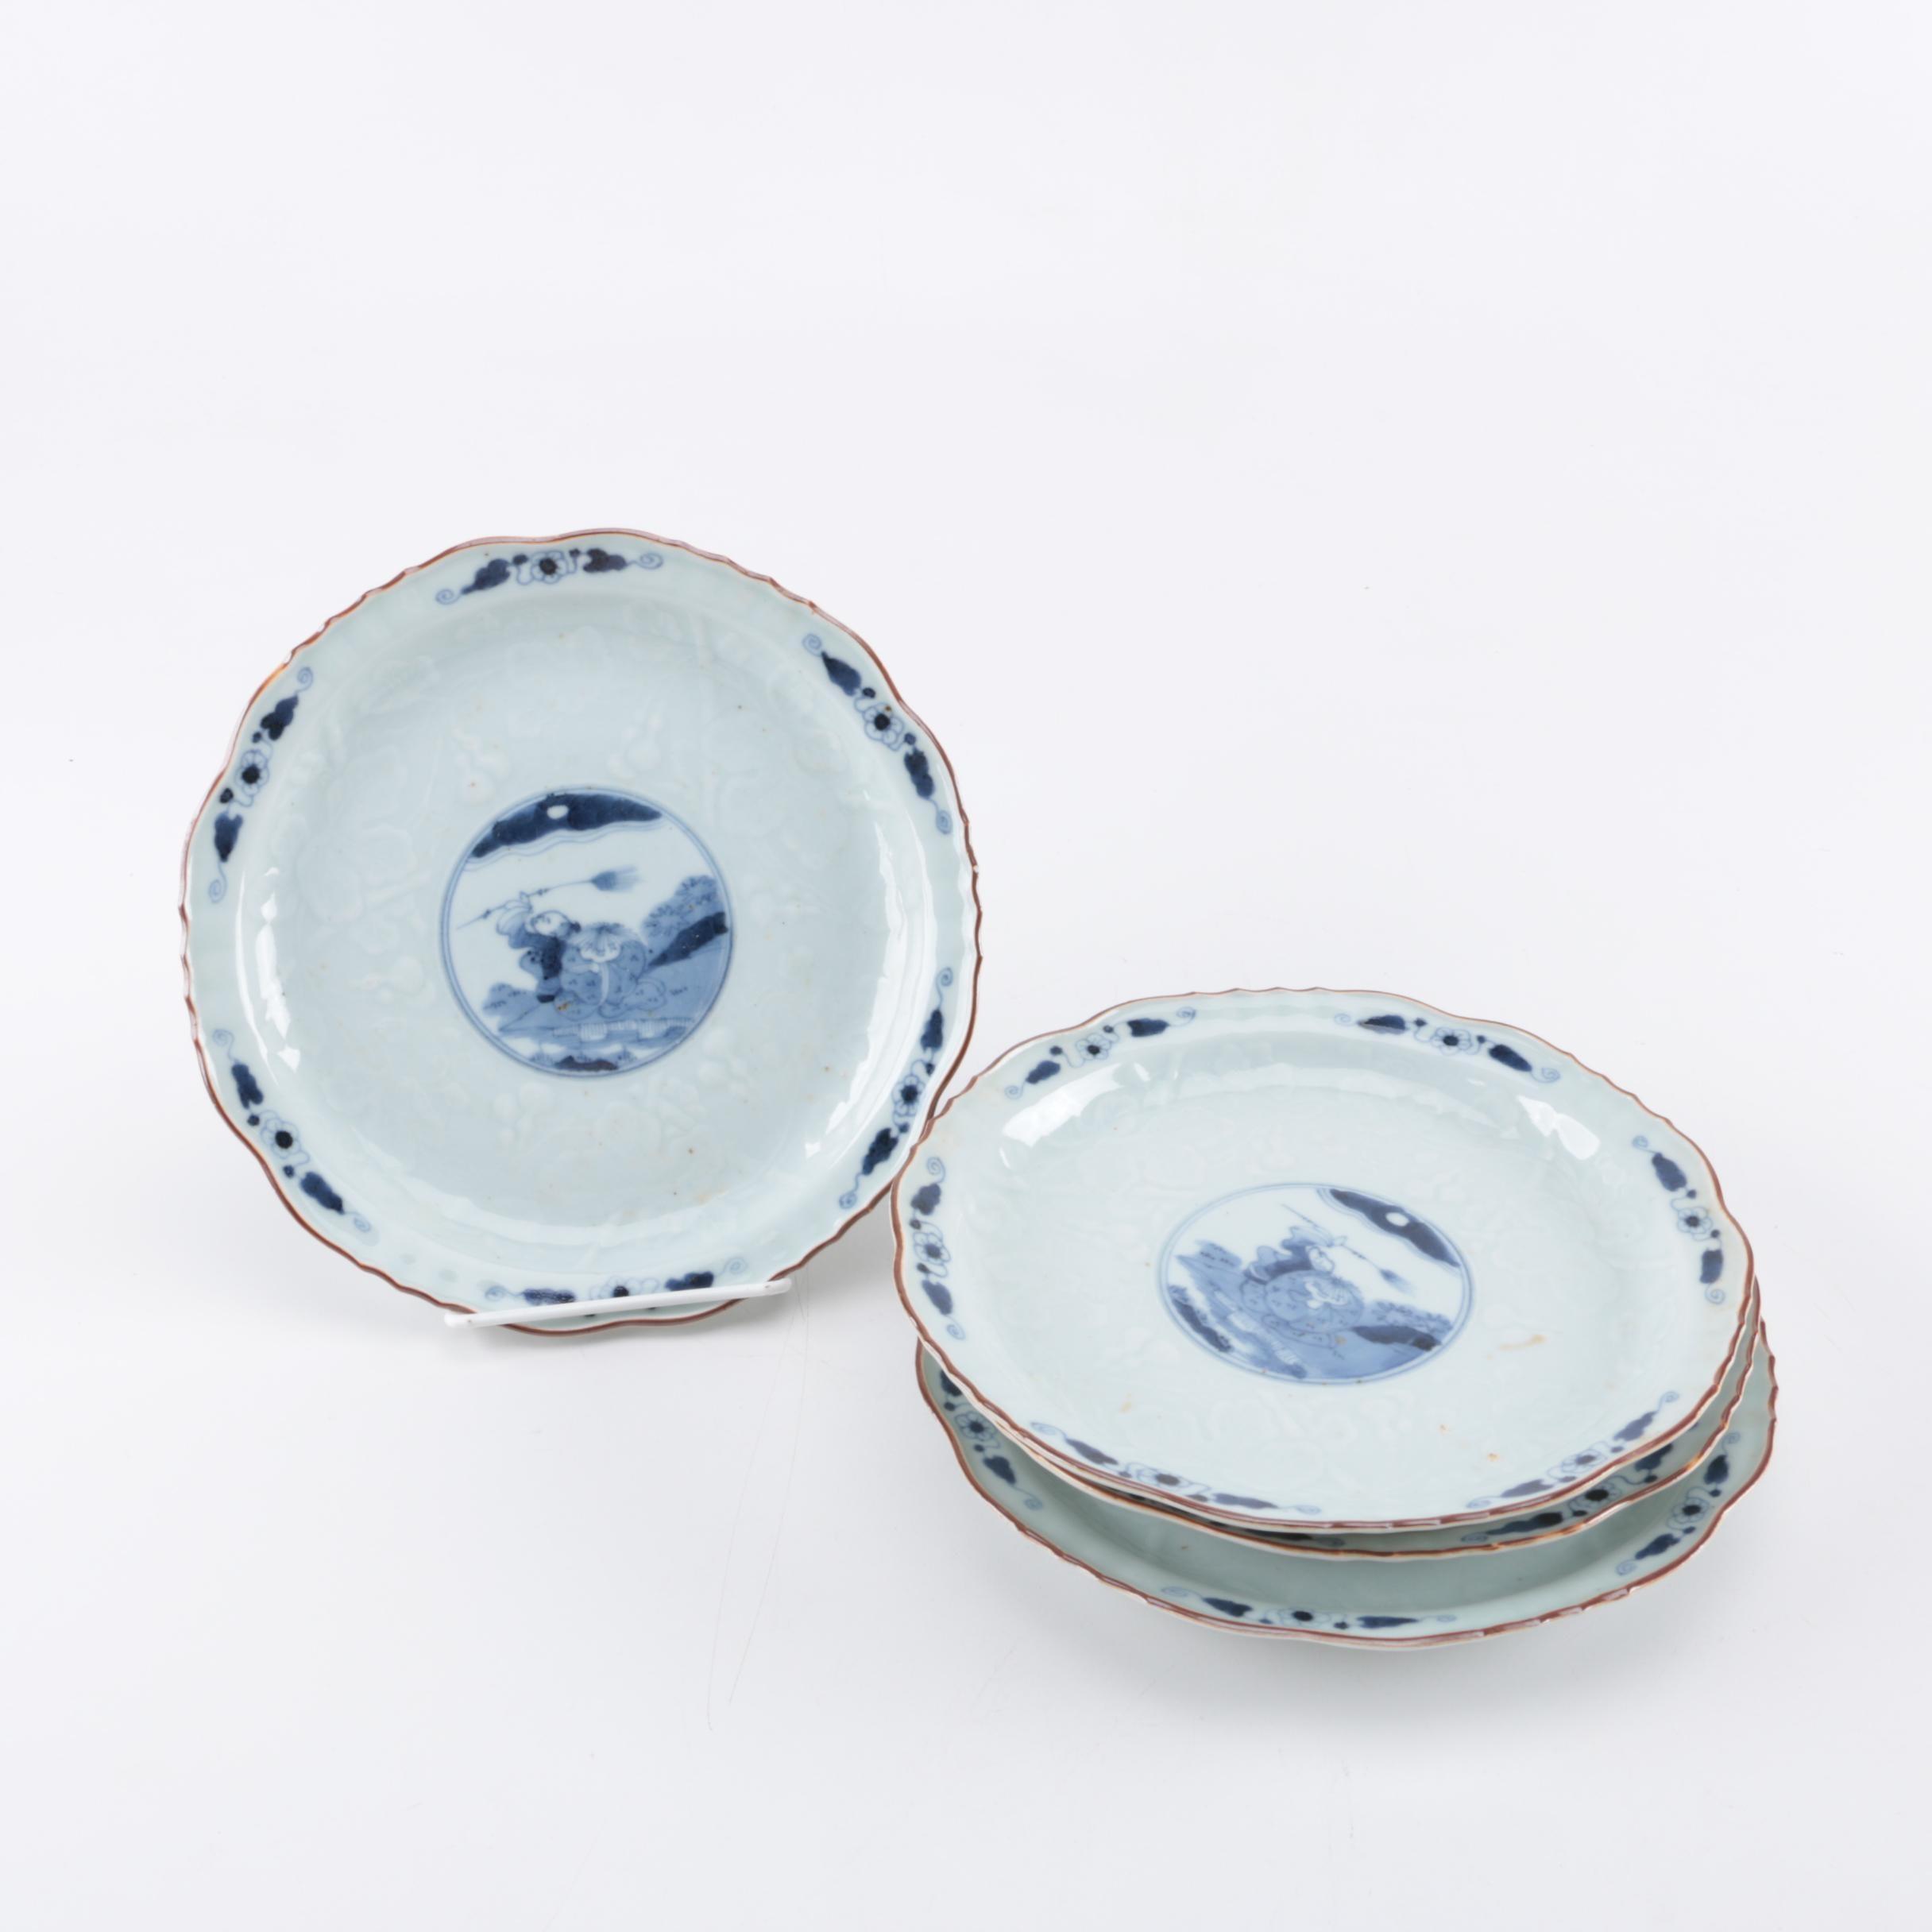 Vintage Asian Transferware Ceramic Plates